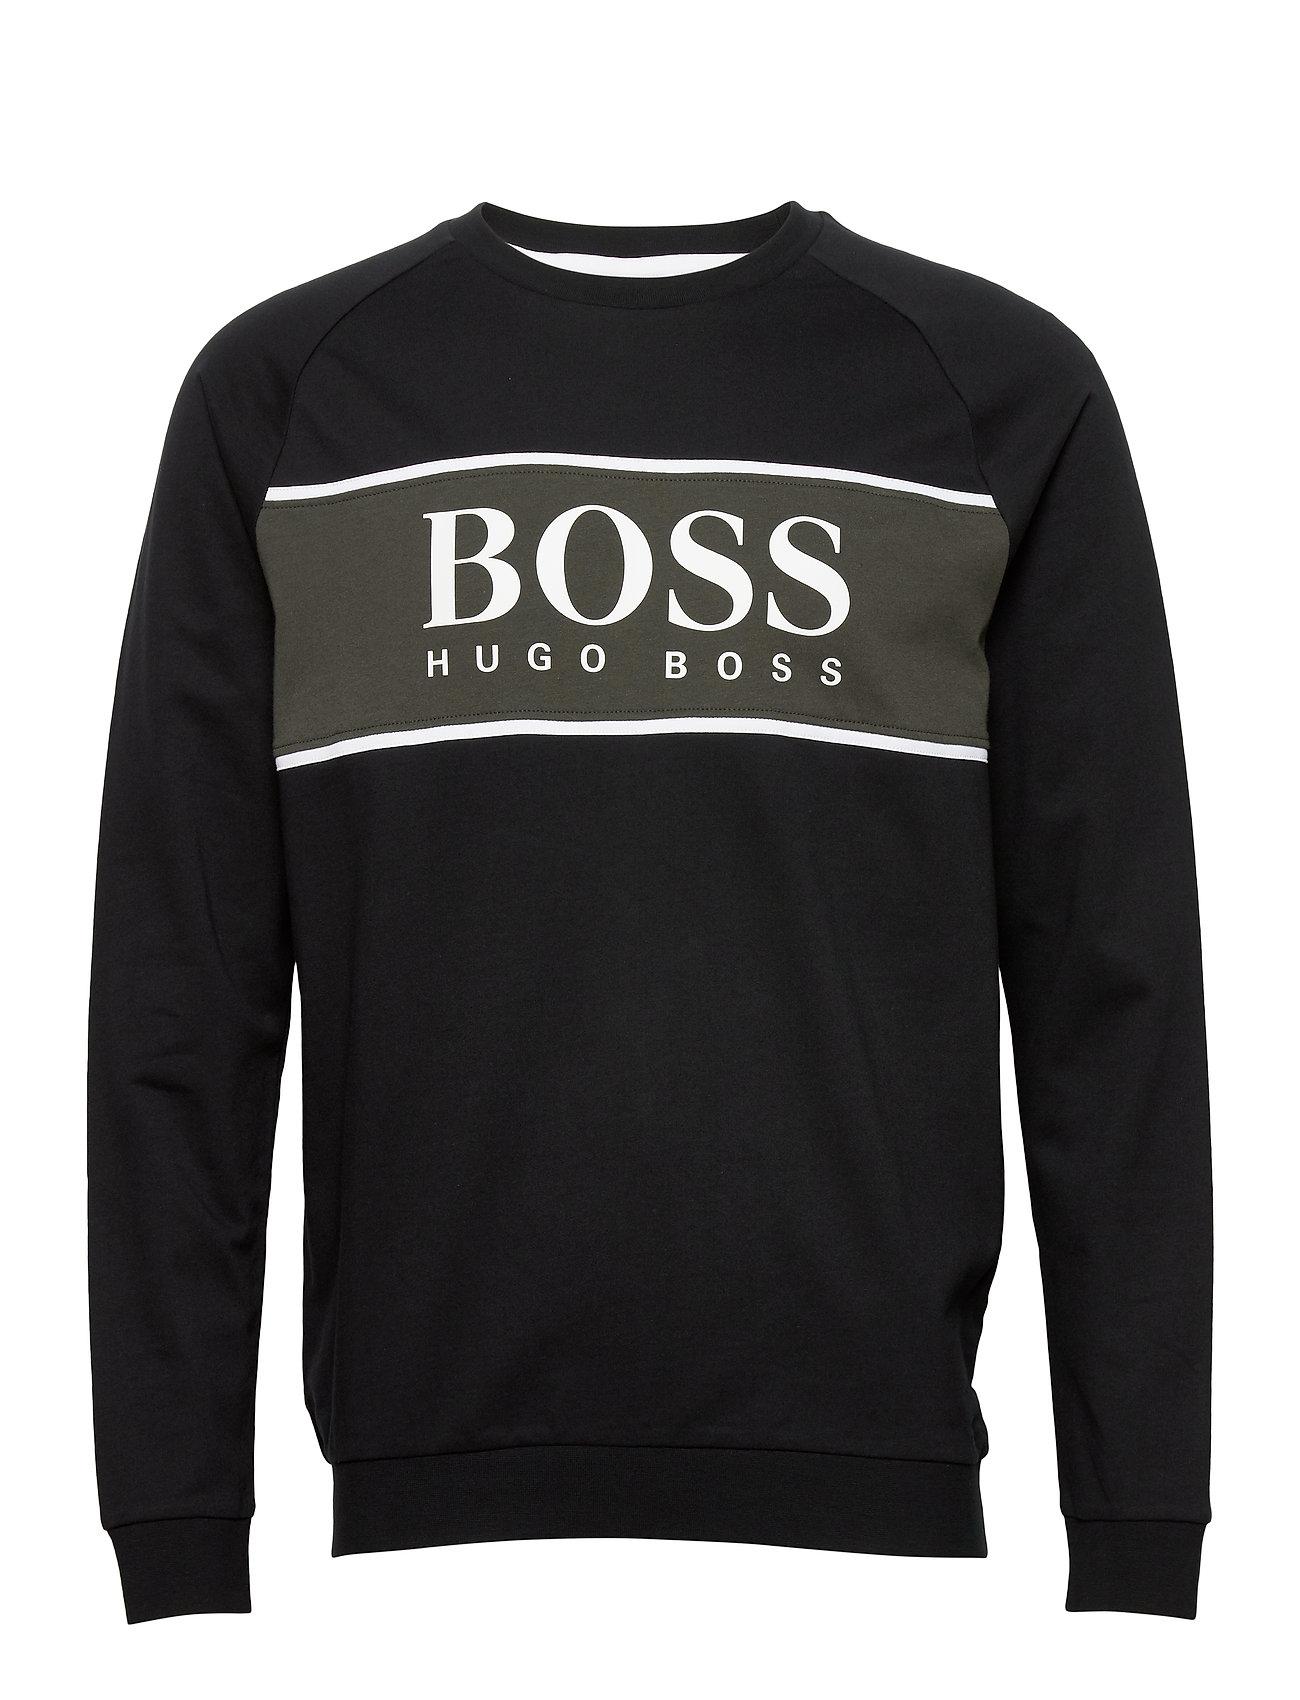 BOSS Authentic Sweatshirt - BLACK